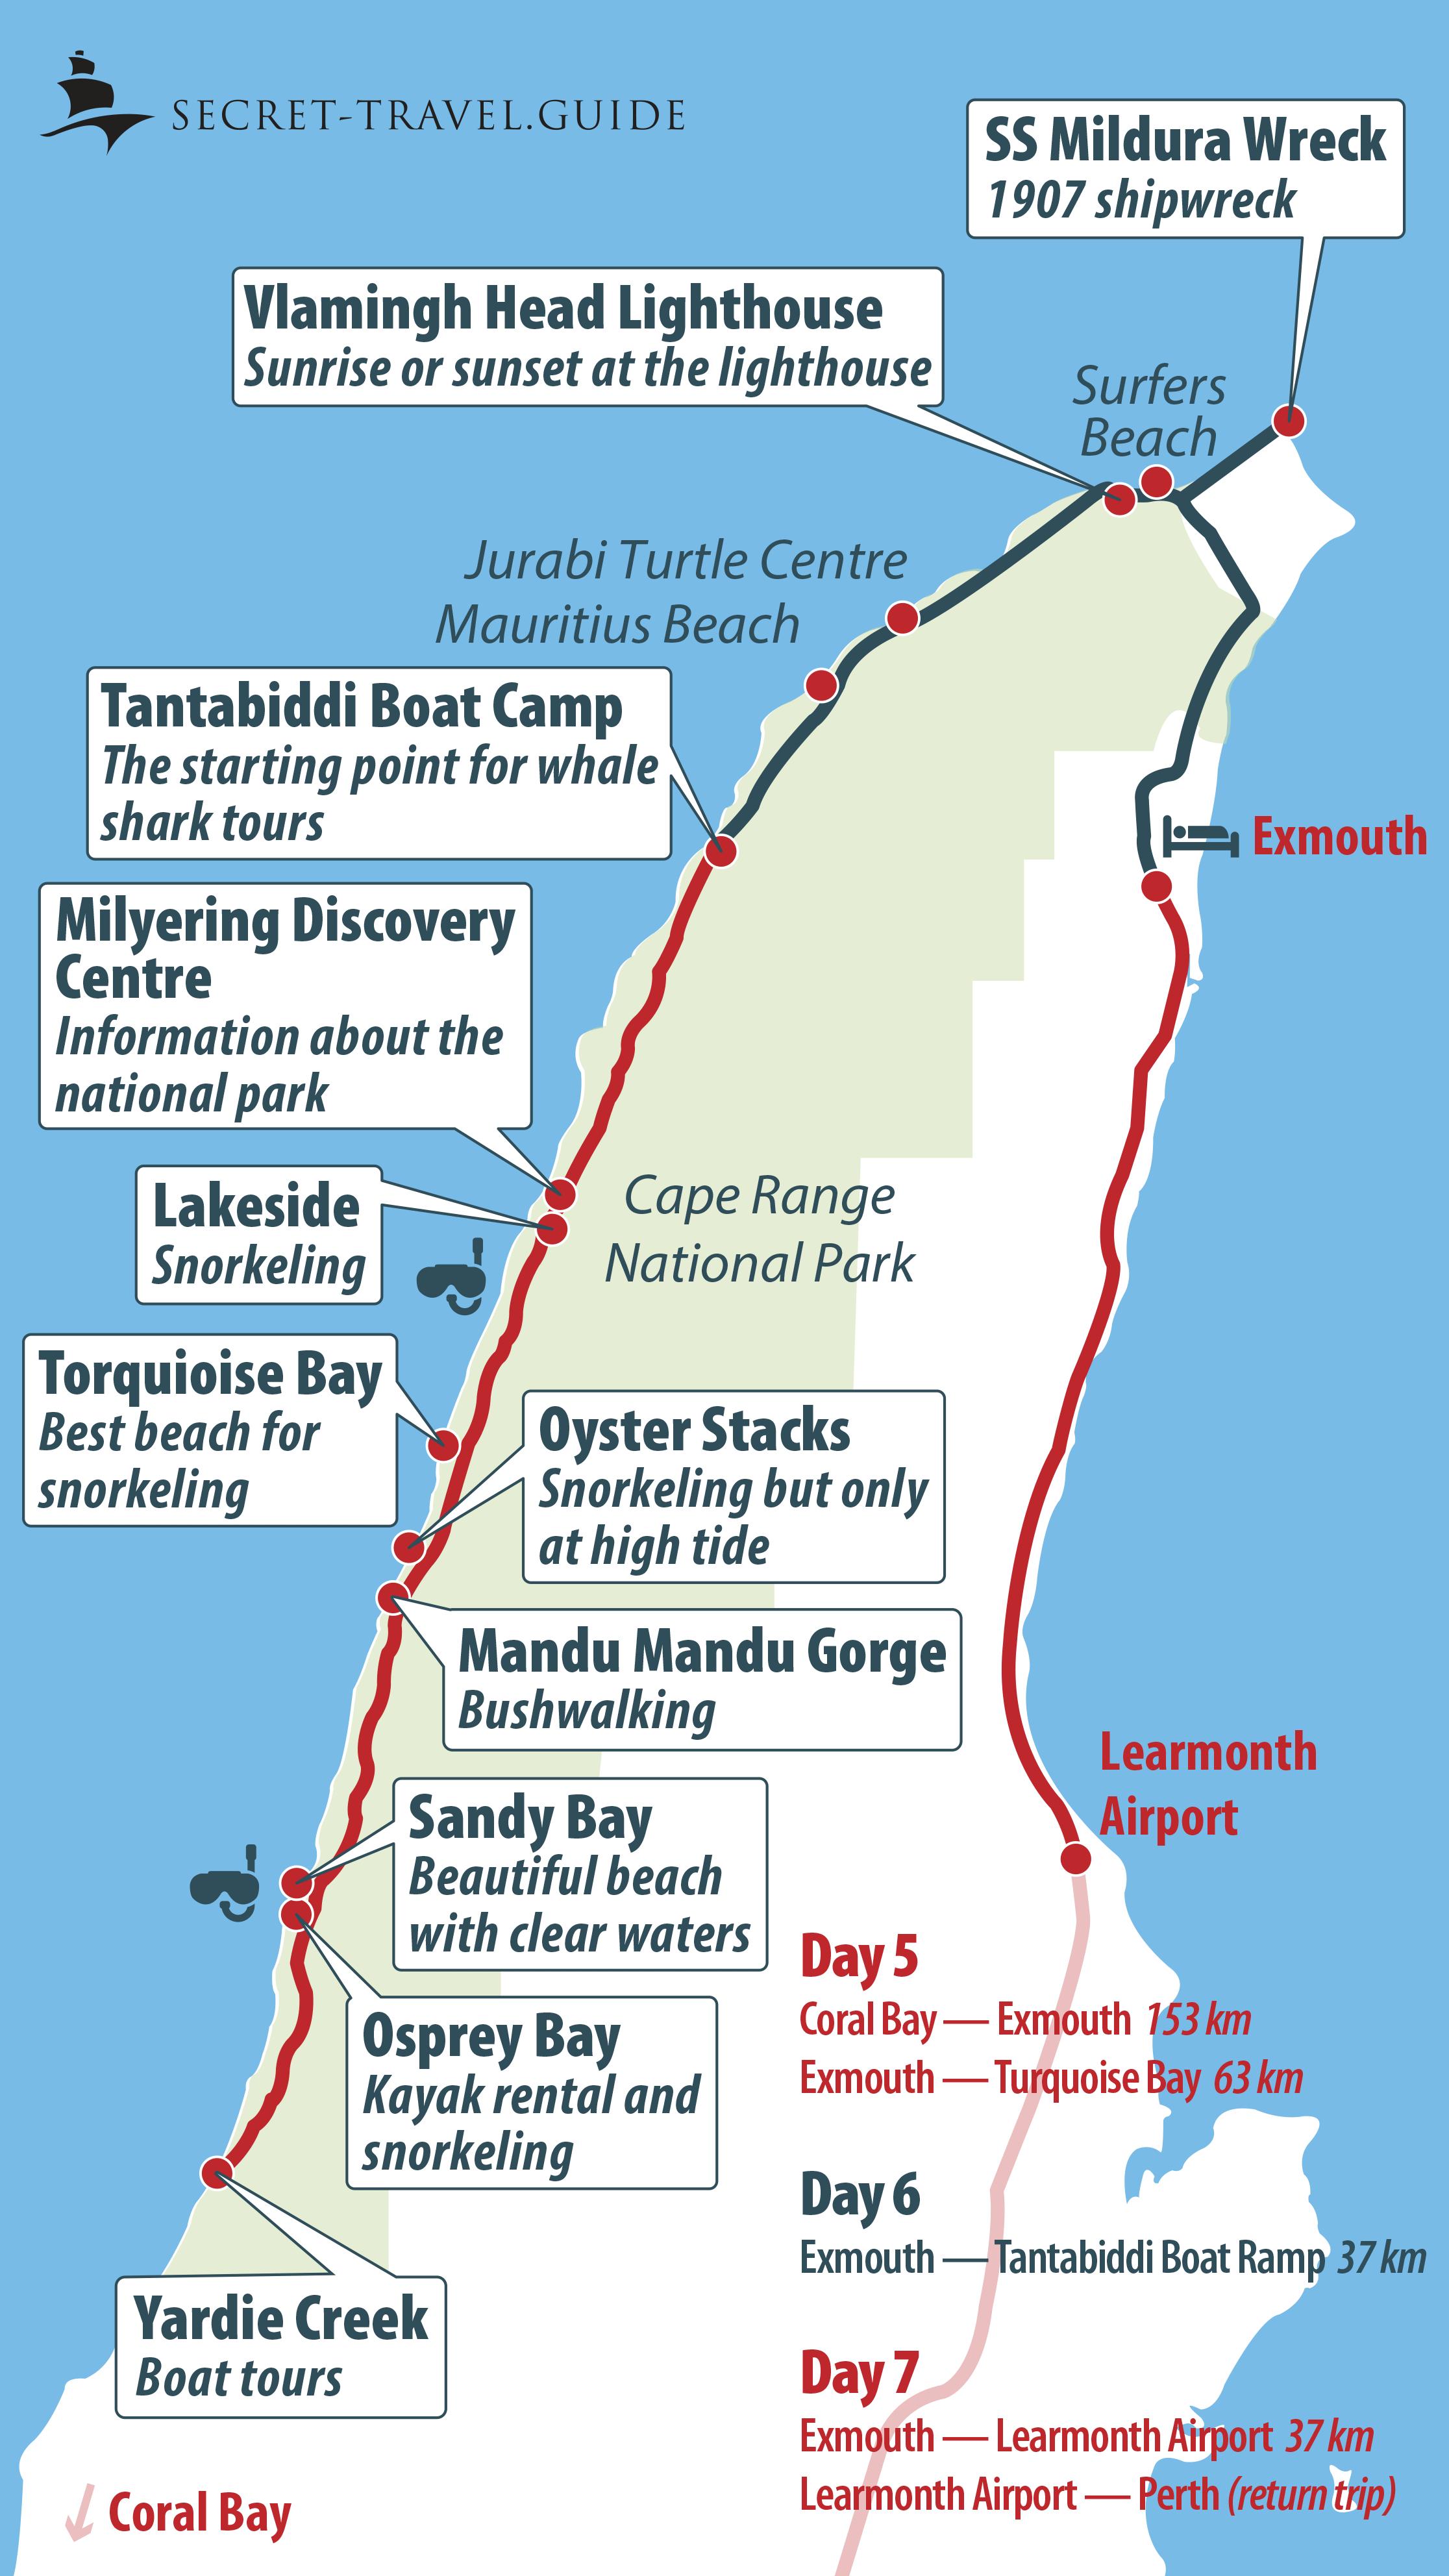 Ningaloo Reef map / Exmouth map